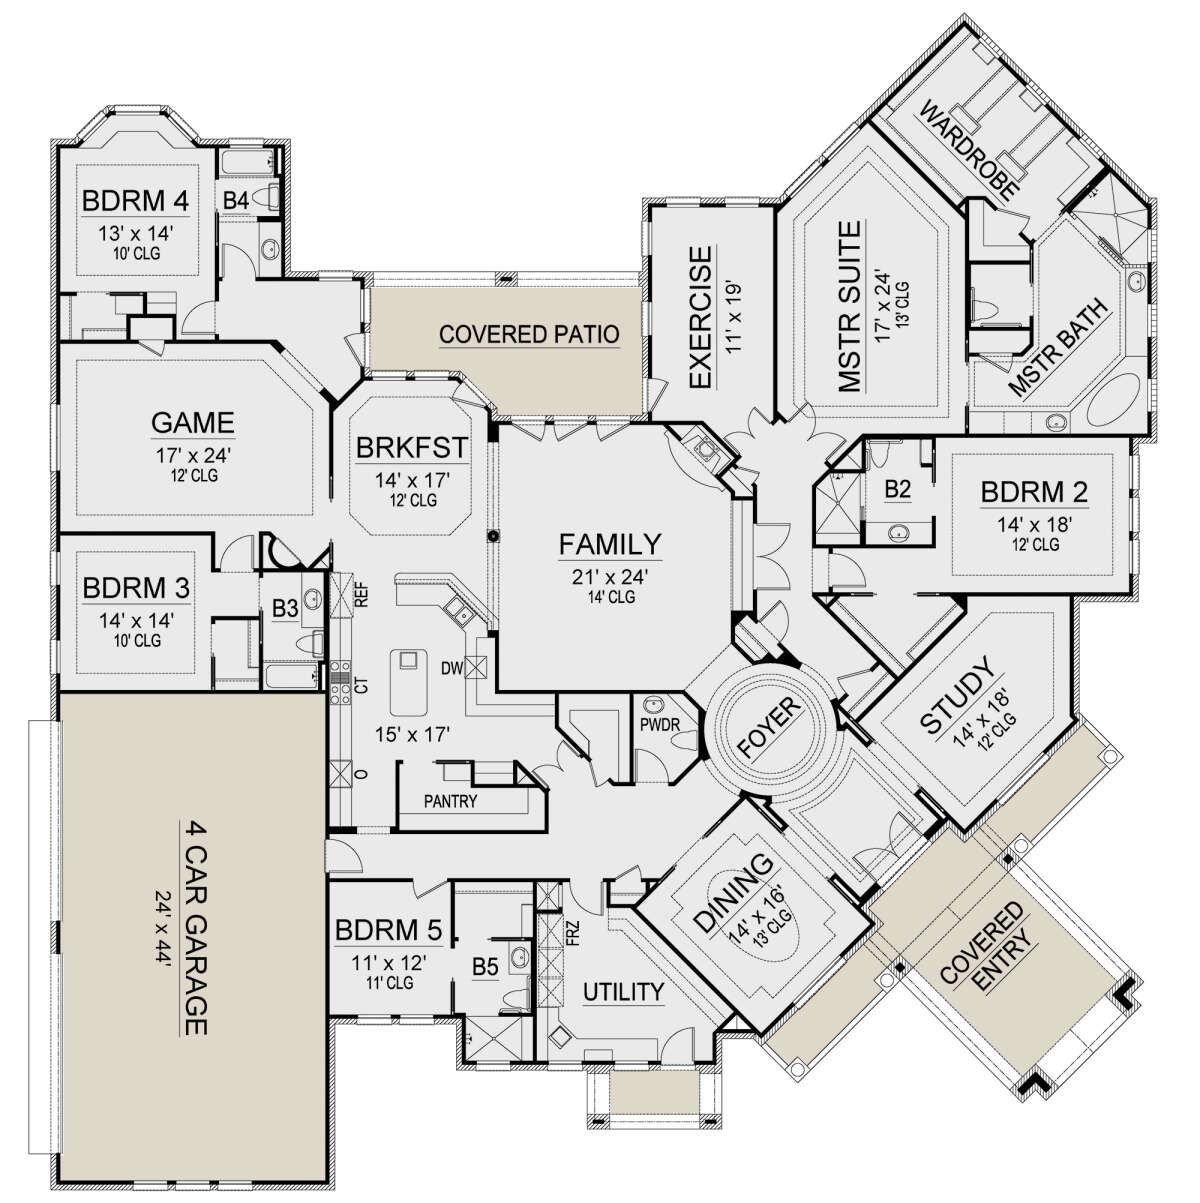 House Plan 5445 00397 Luxury Plan 6 091 Square Feet 5 Bedrooms 5 5 Bathrooms In 2020 Luxury Plan House Plans Dream House Plans